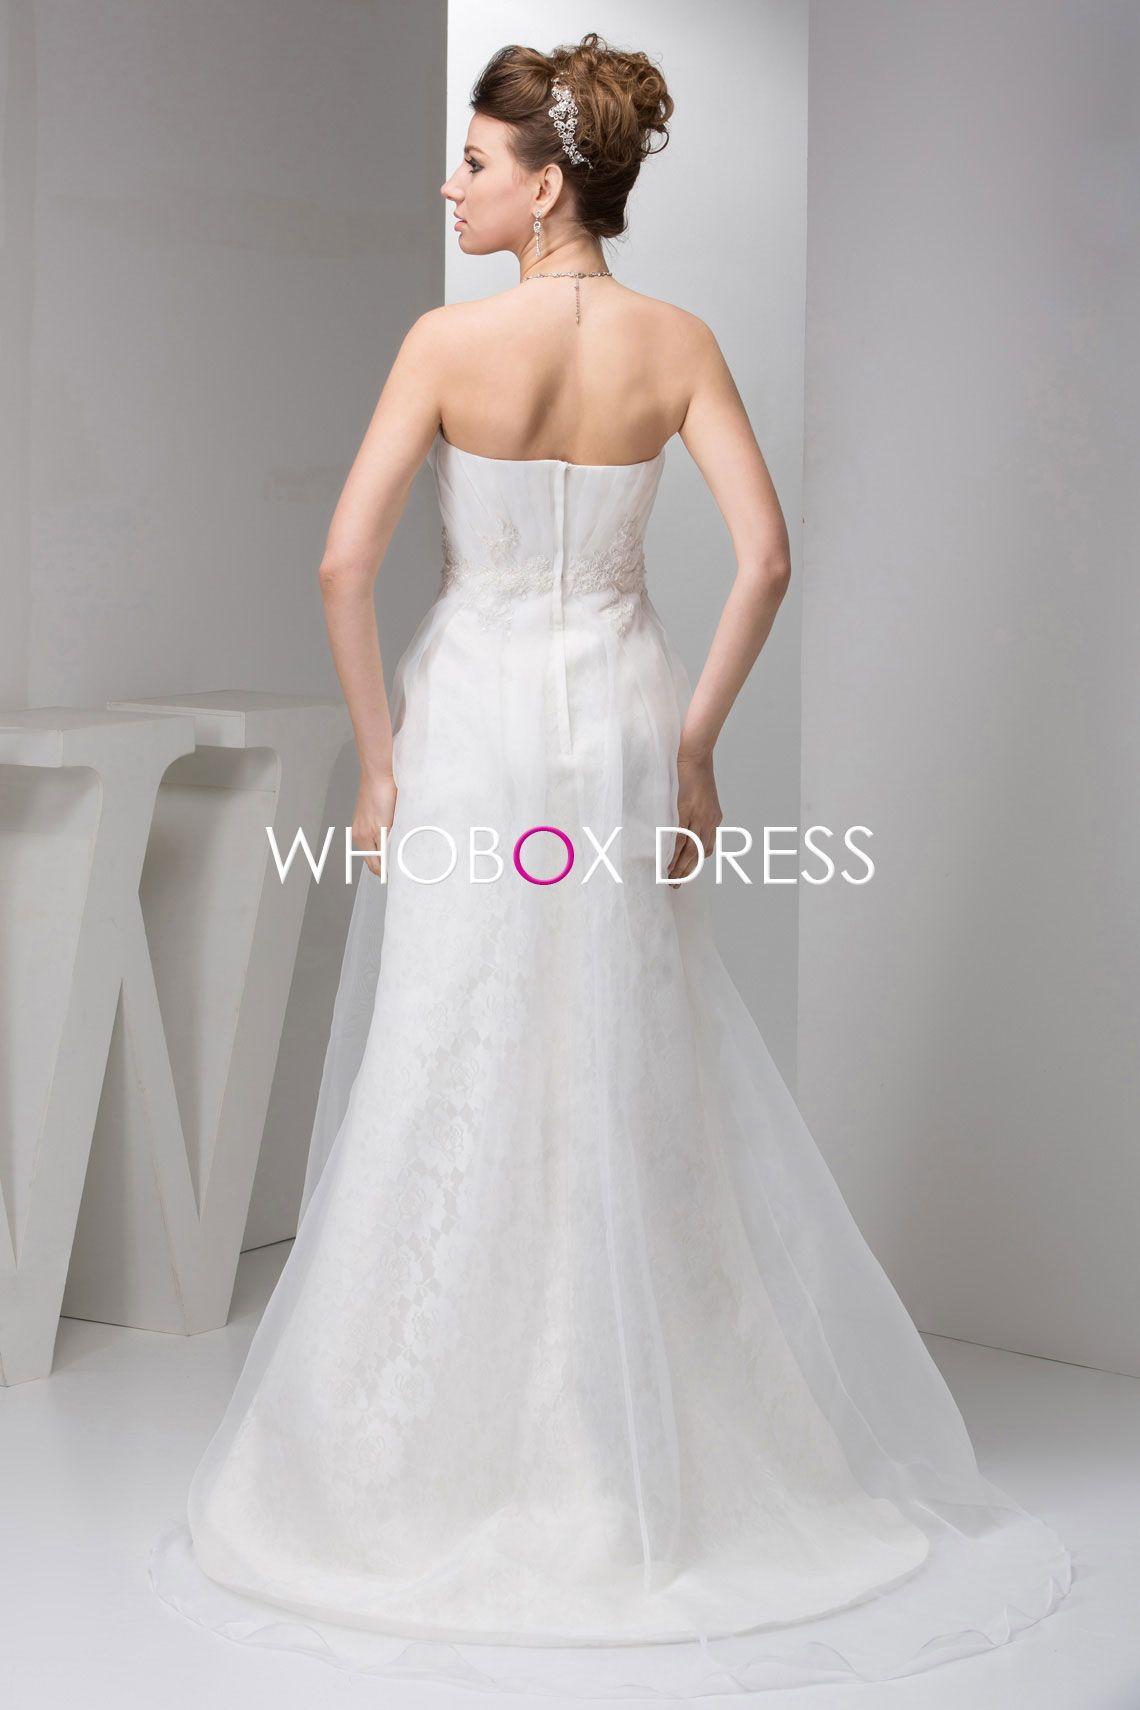 Cinderella wedding dress disney store  wedding dress wedding dresses  Wedding dresses  Pinterest